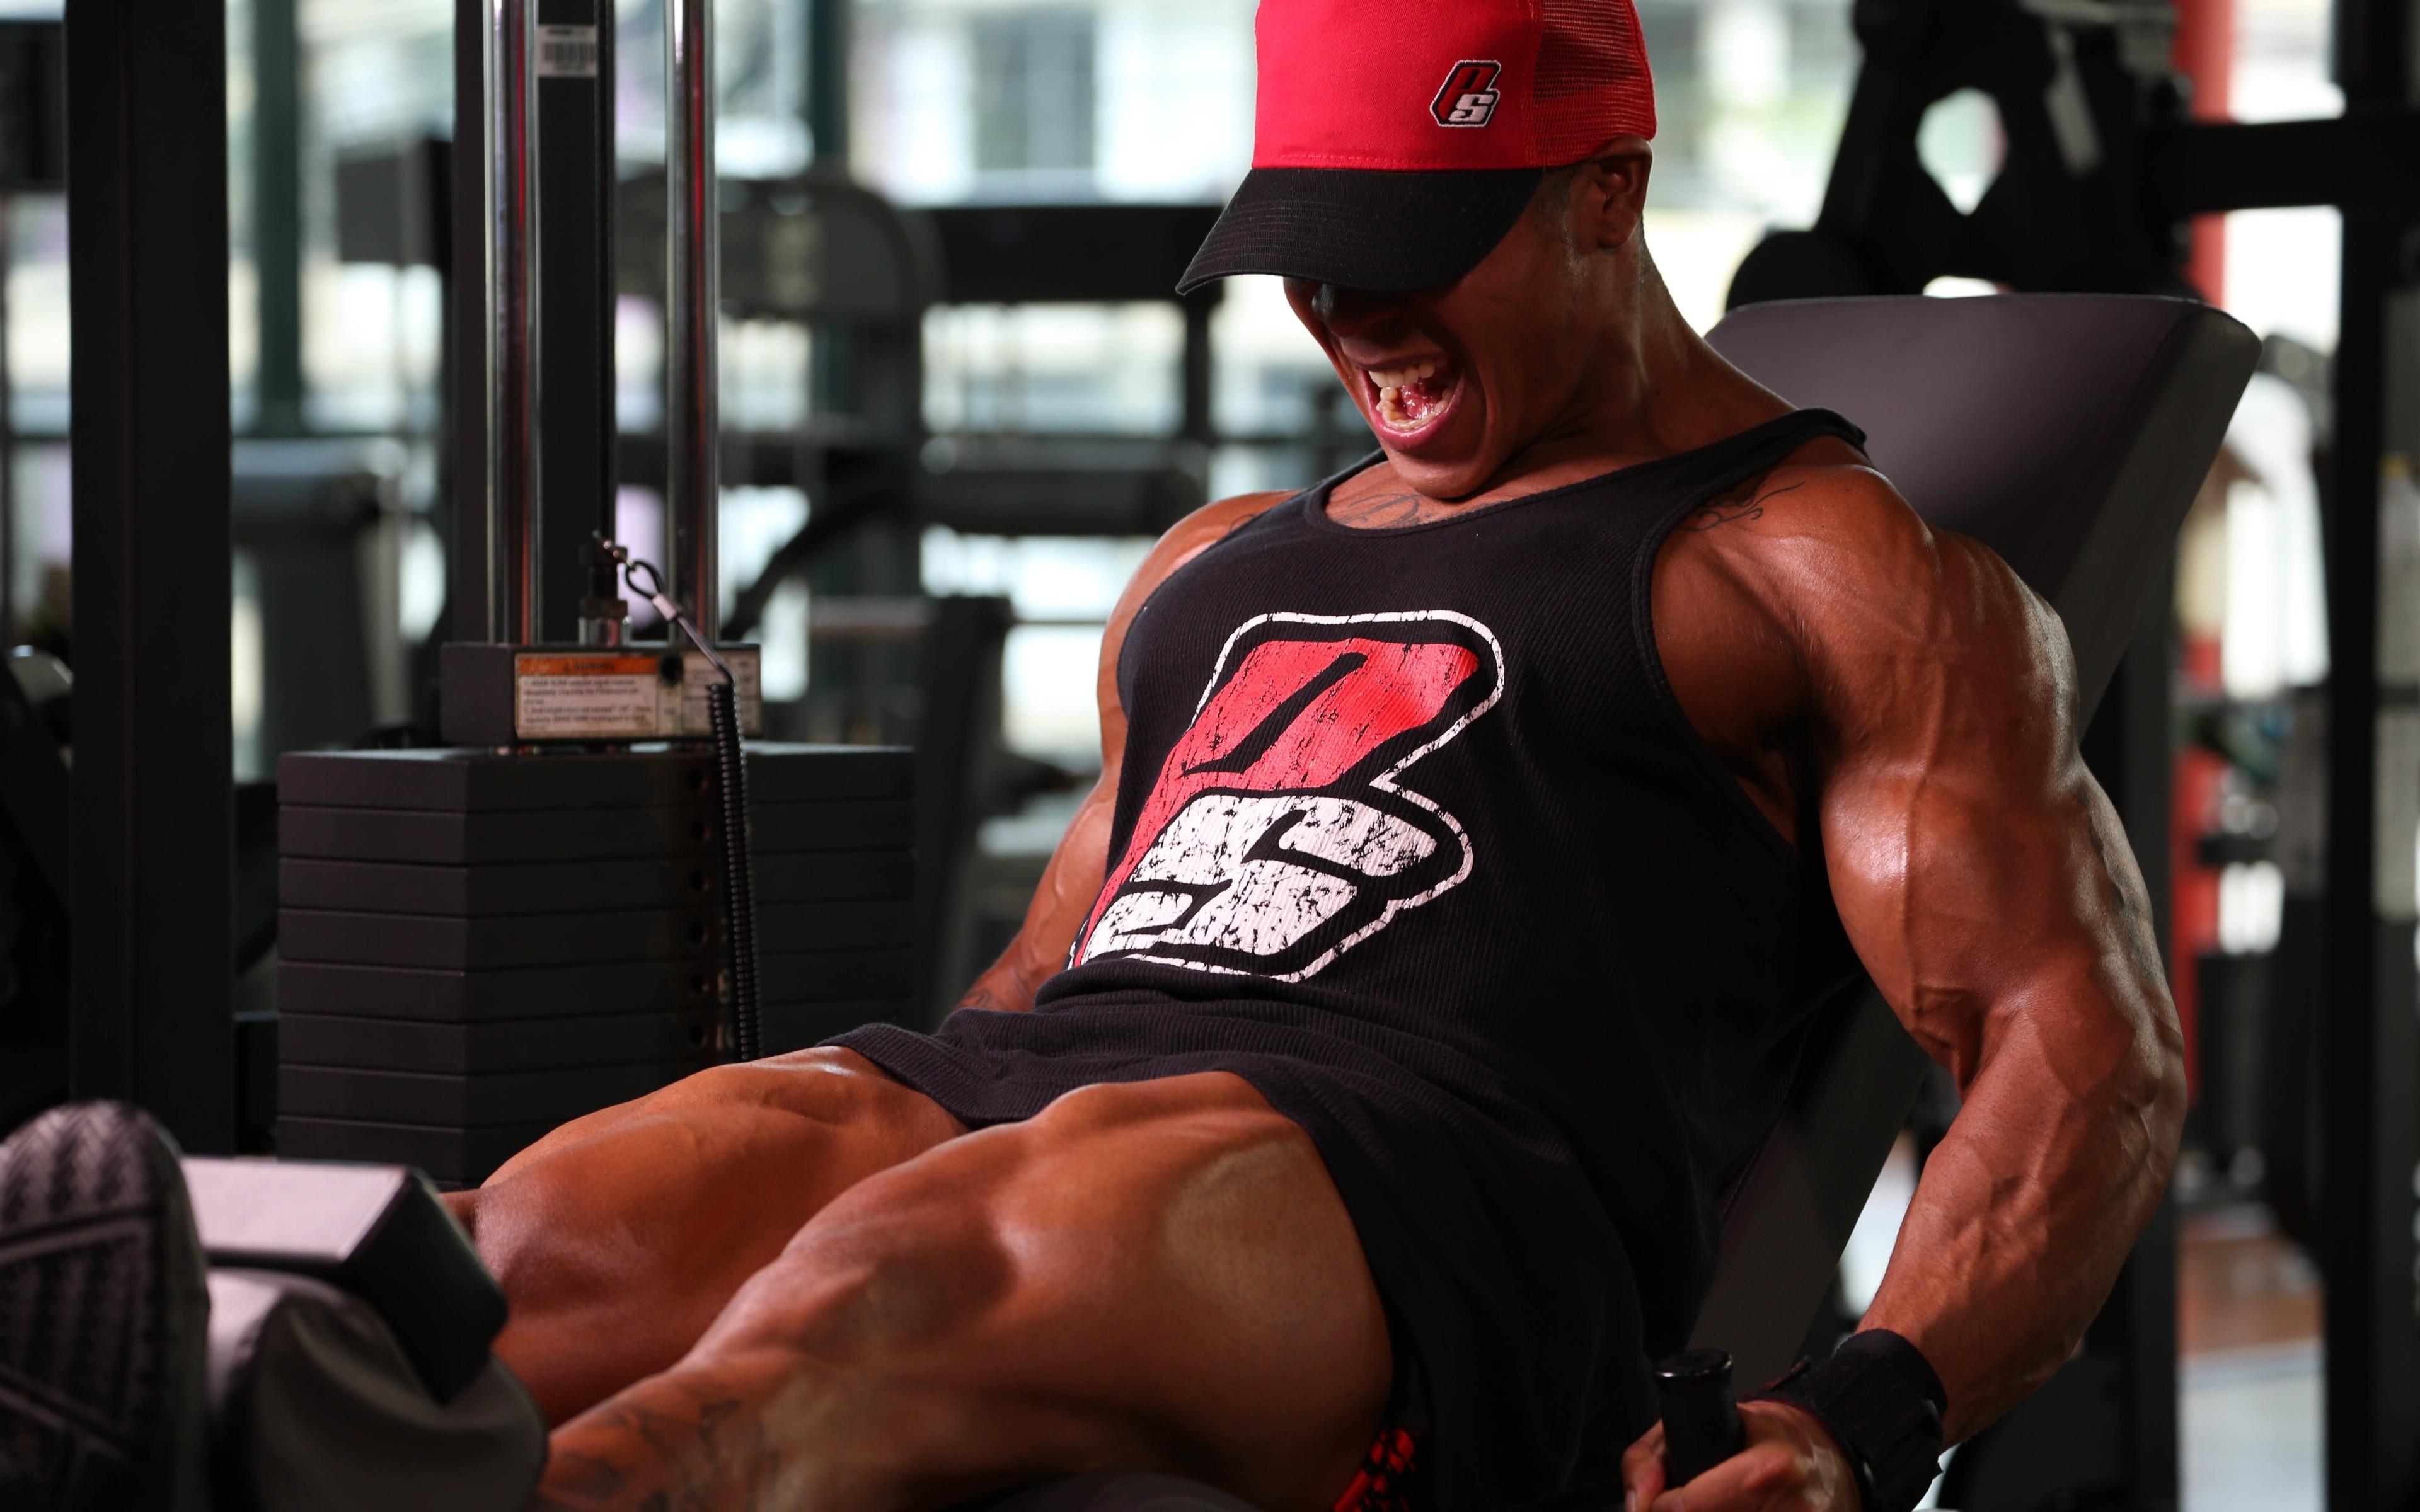 Wallpaper Bodybuilding, Exercise, Motivation, Training